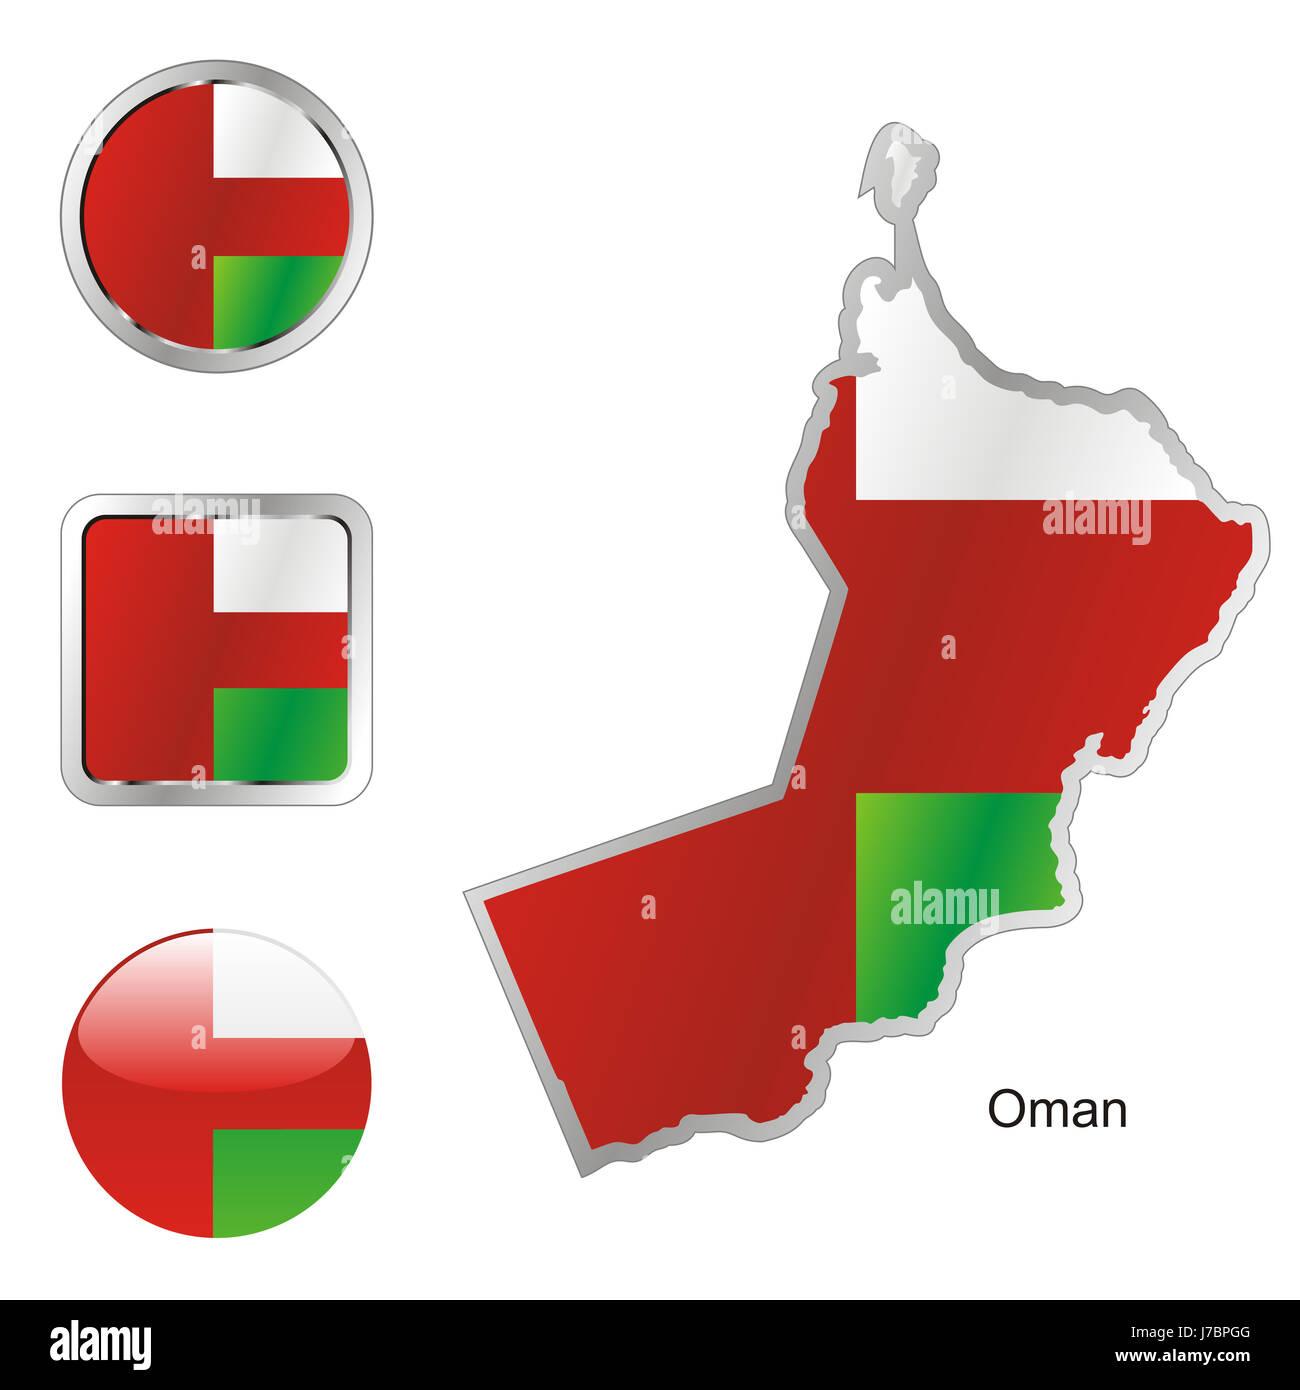 Oman Map Vector Stock Photos & Oman Map Vector Stock Images - Alamy